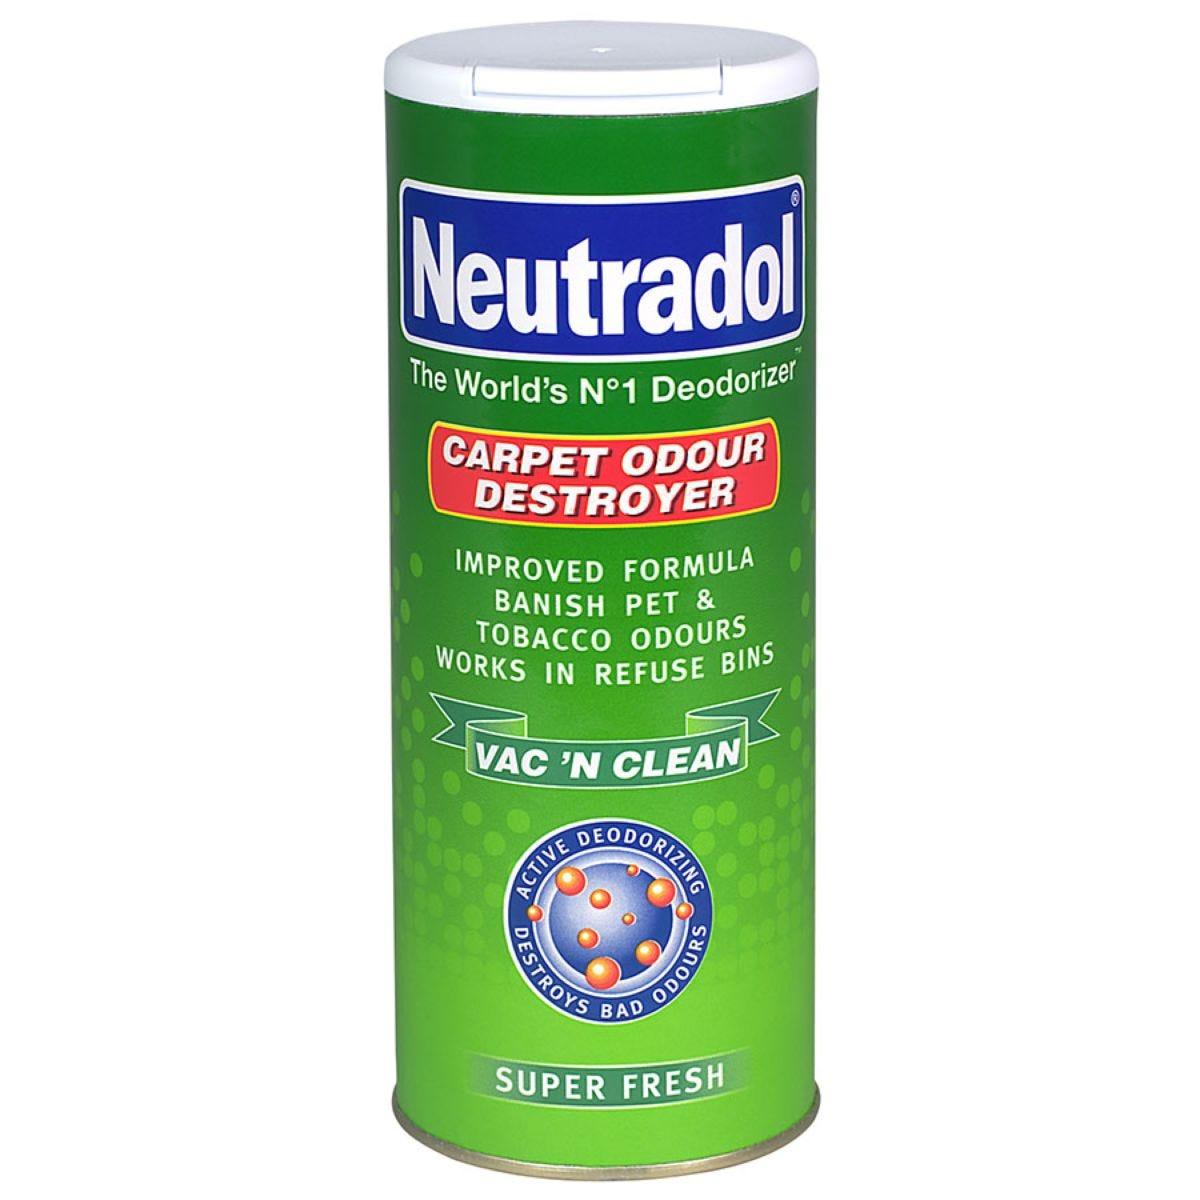 Neutradol Super Fresh Carpet Deodoriser - 350g